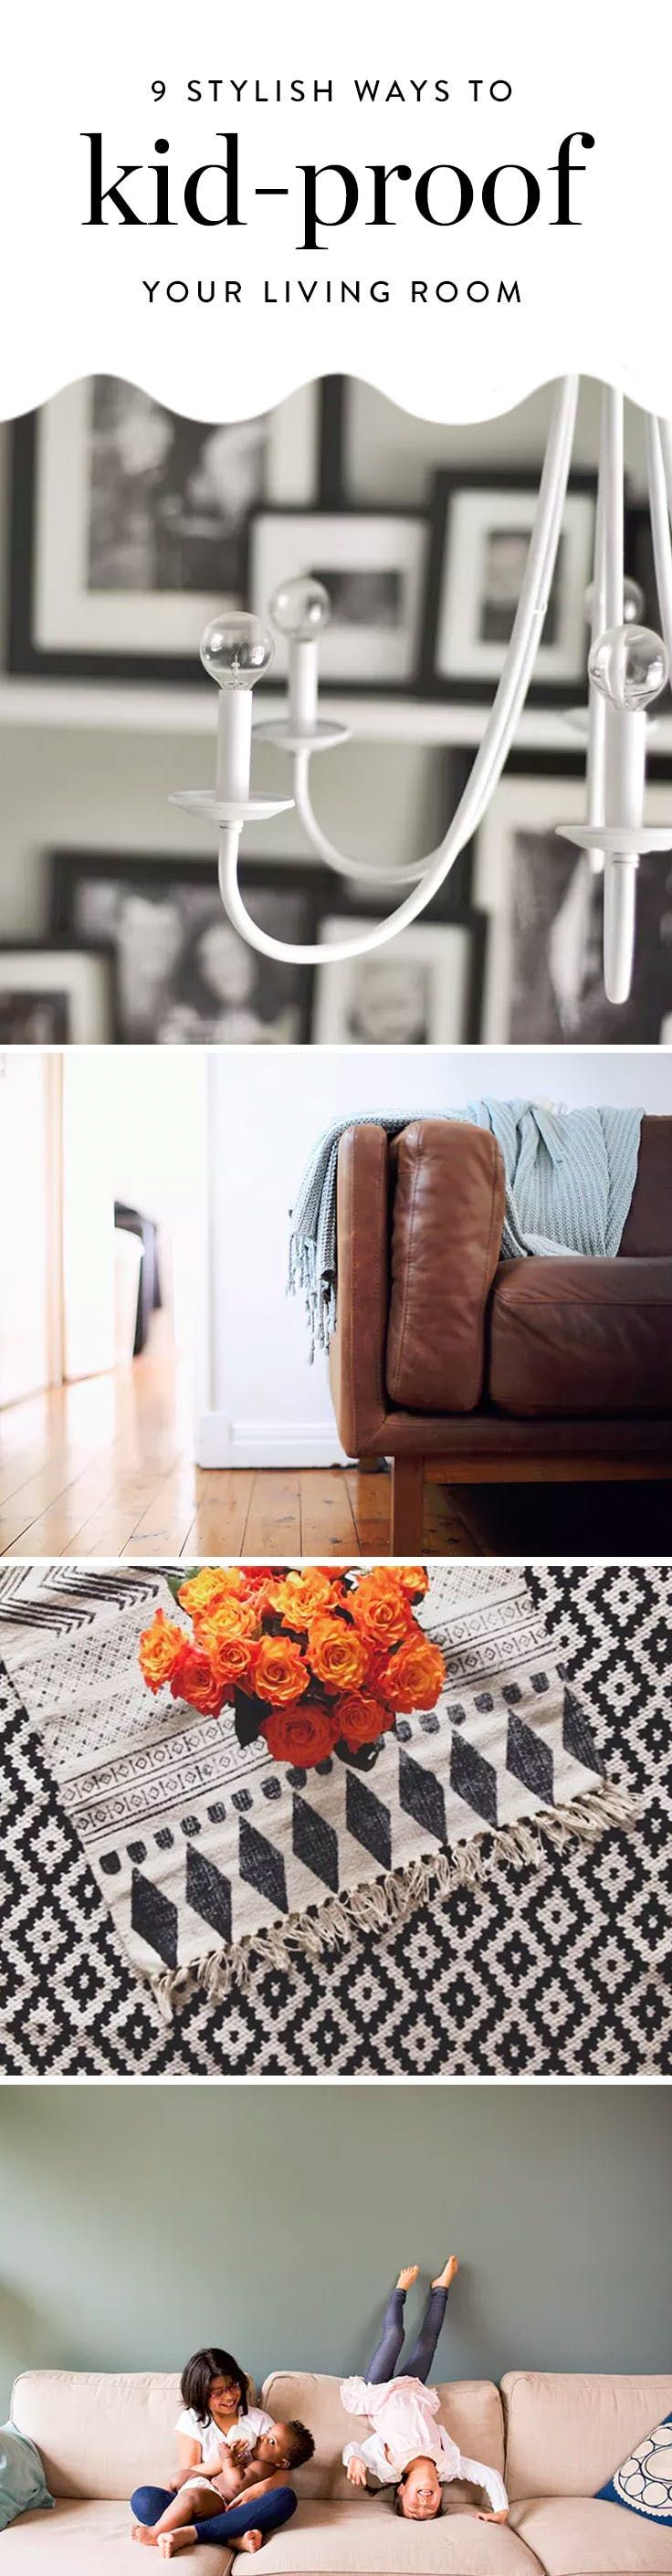 9 Ways To Stylishly Kid Proof Your Living Room